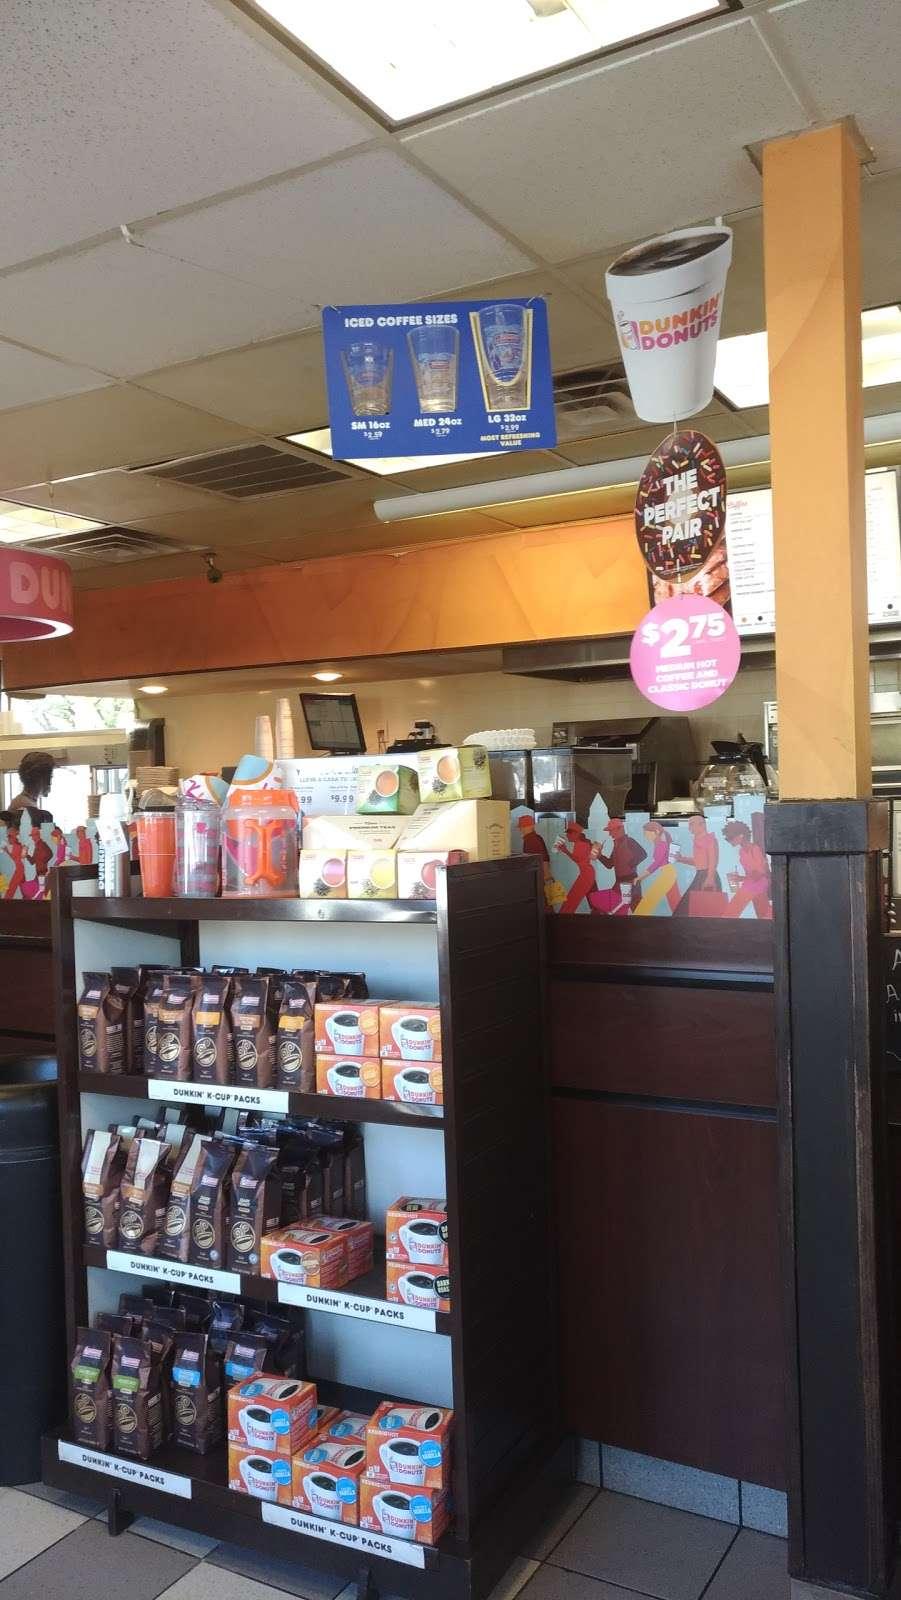 Dunkin Donuts - cafe  | Photo 5 of 10 | Address: 402 Grand St #436, Jersey City, NJ 07302, USA | Phone: (201) 309-0777